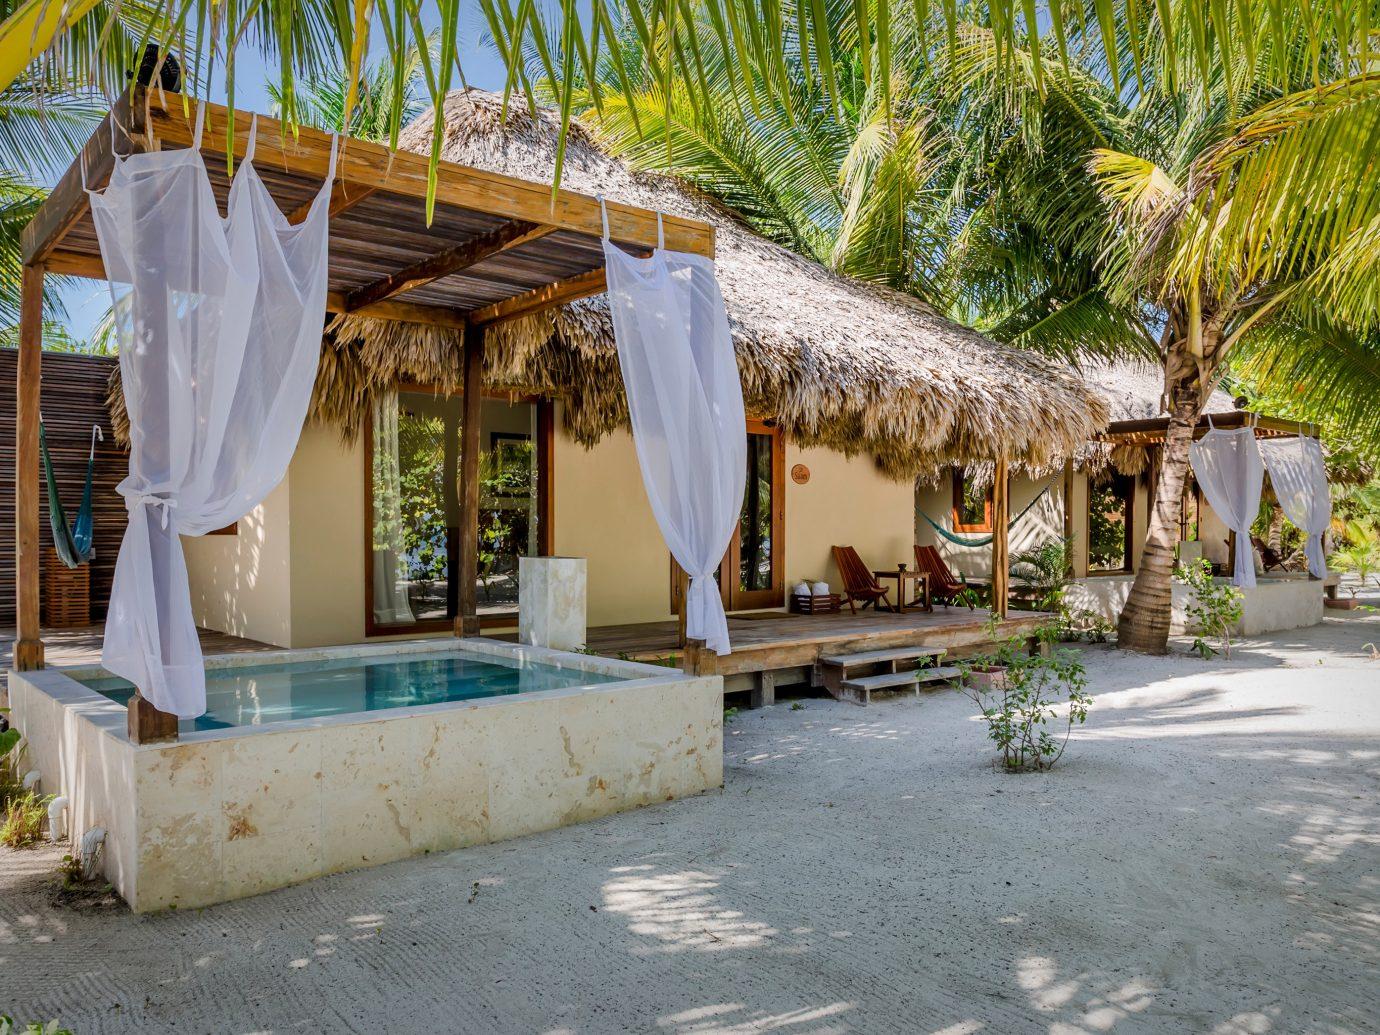 El Secreto Luxury Hotel In San Pedro, Belize